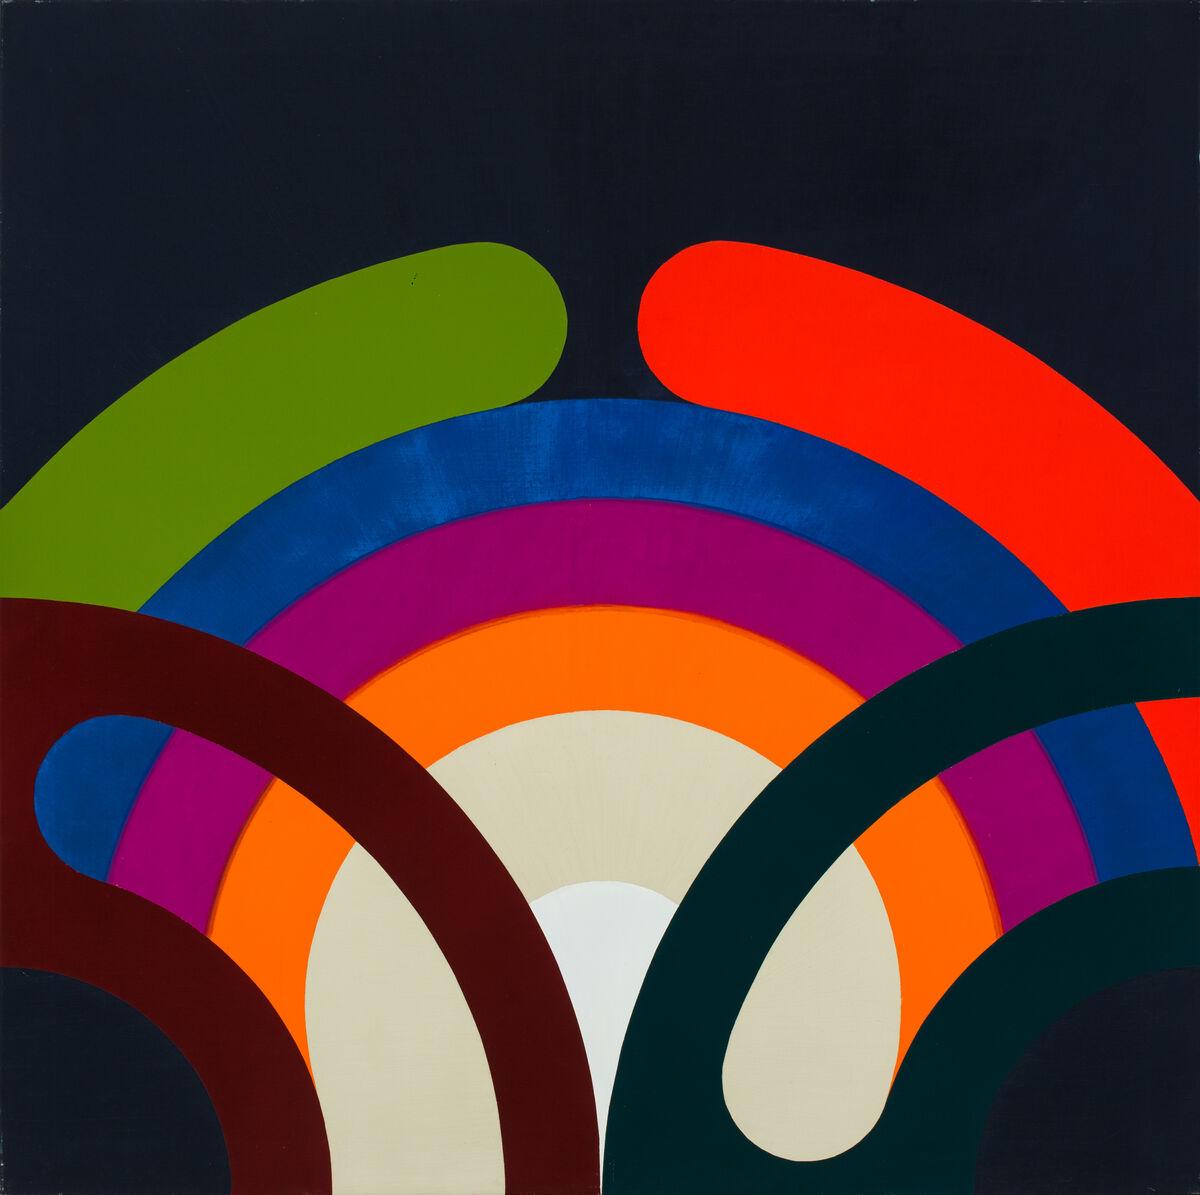 István Nádler, Untitled, 1968. Courtesy of the artist, Elizabeth Dee New York and Kisterem Budapest.